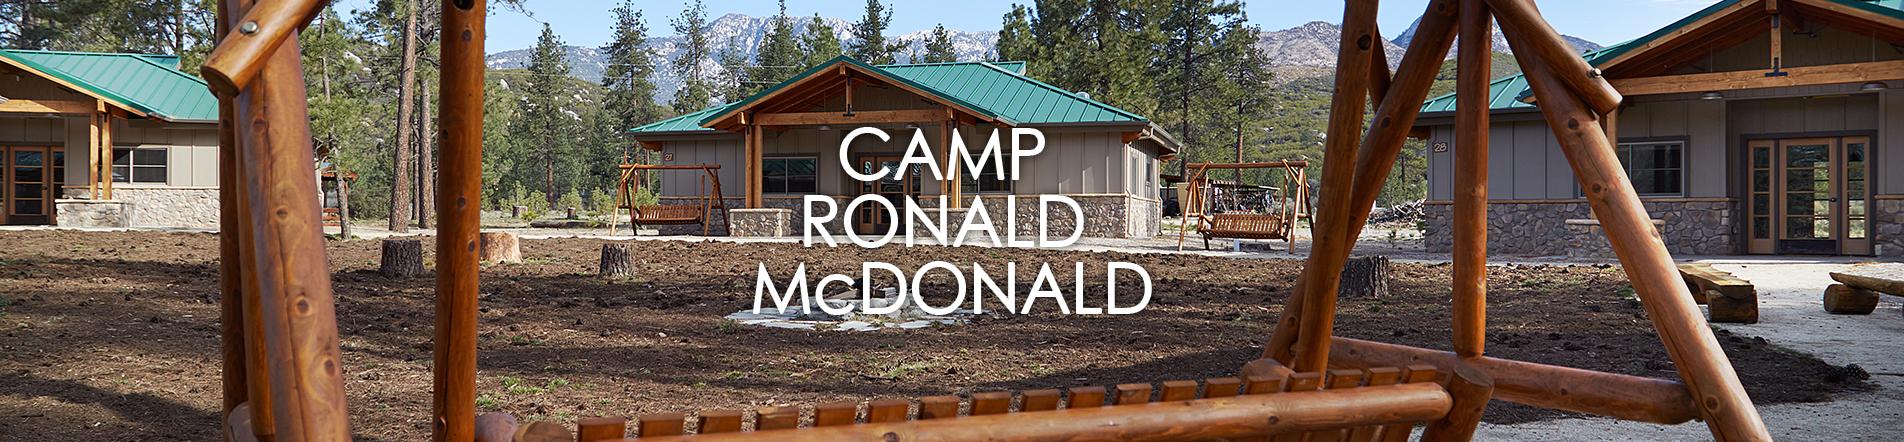 Camp Ronald McDonald Header_COL.jpg